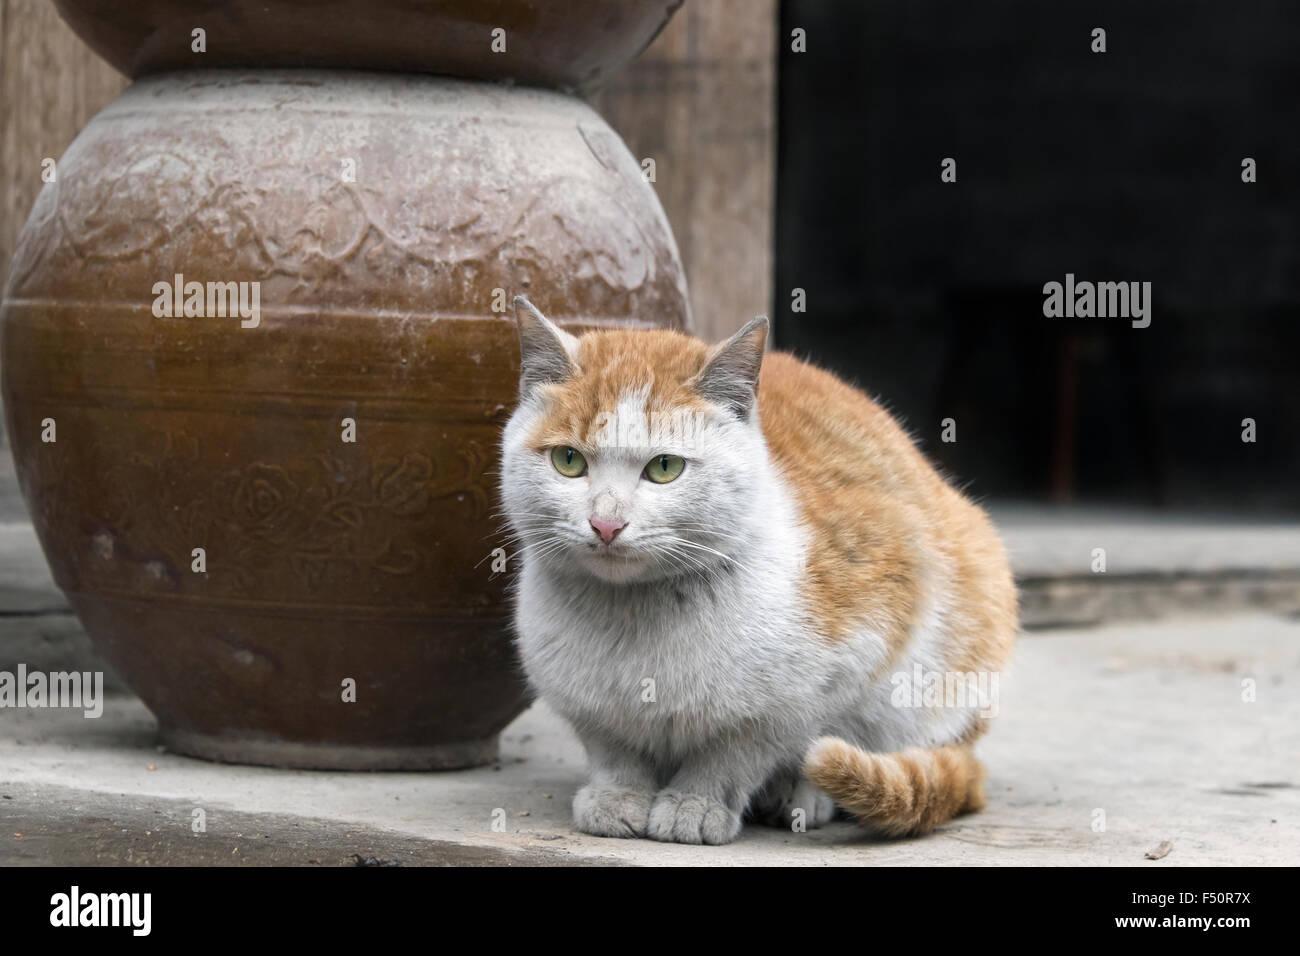 Crouching cat and vase, Shiqiao Miao Village, Guizhou Province, China - Stock Image